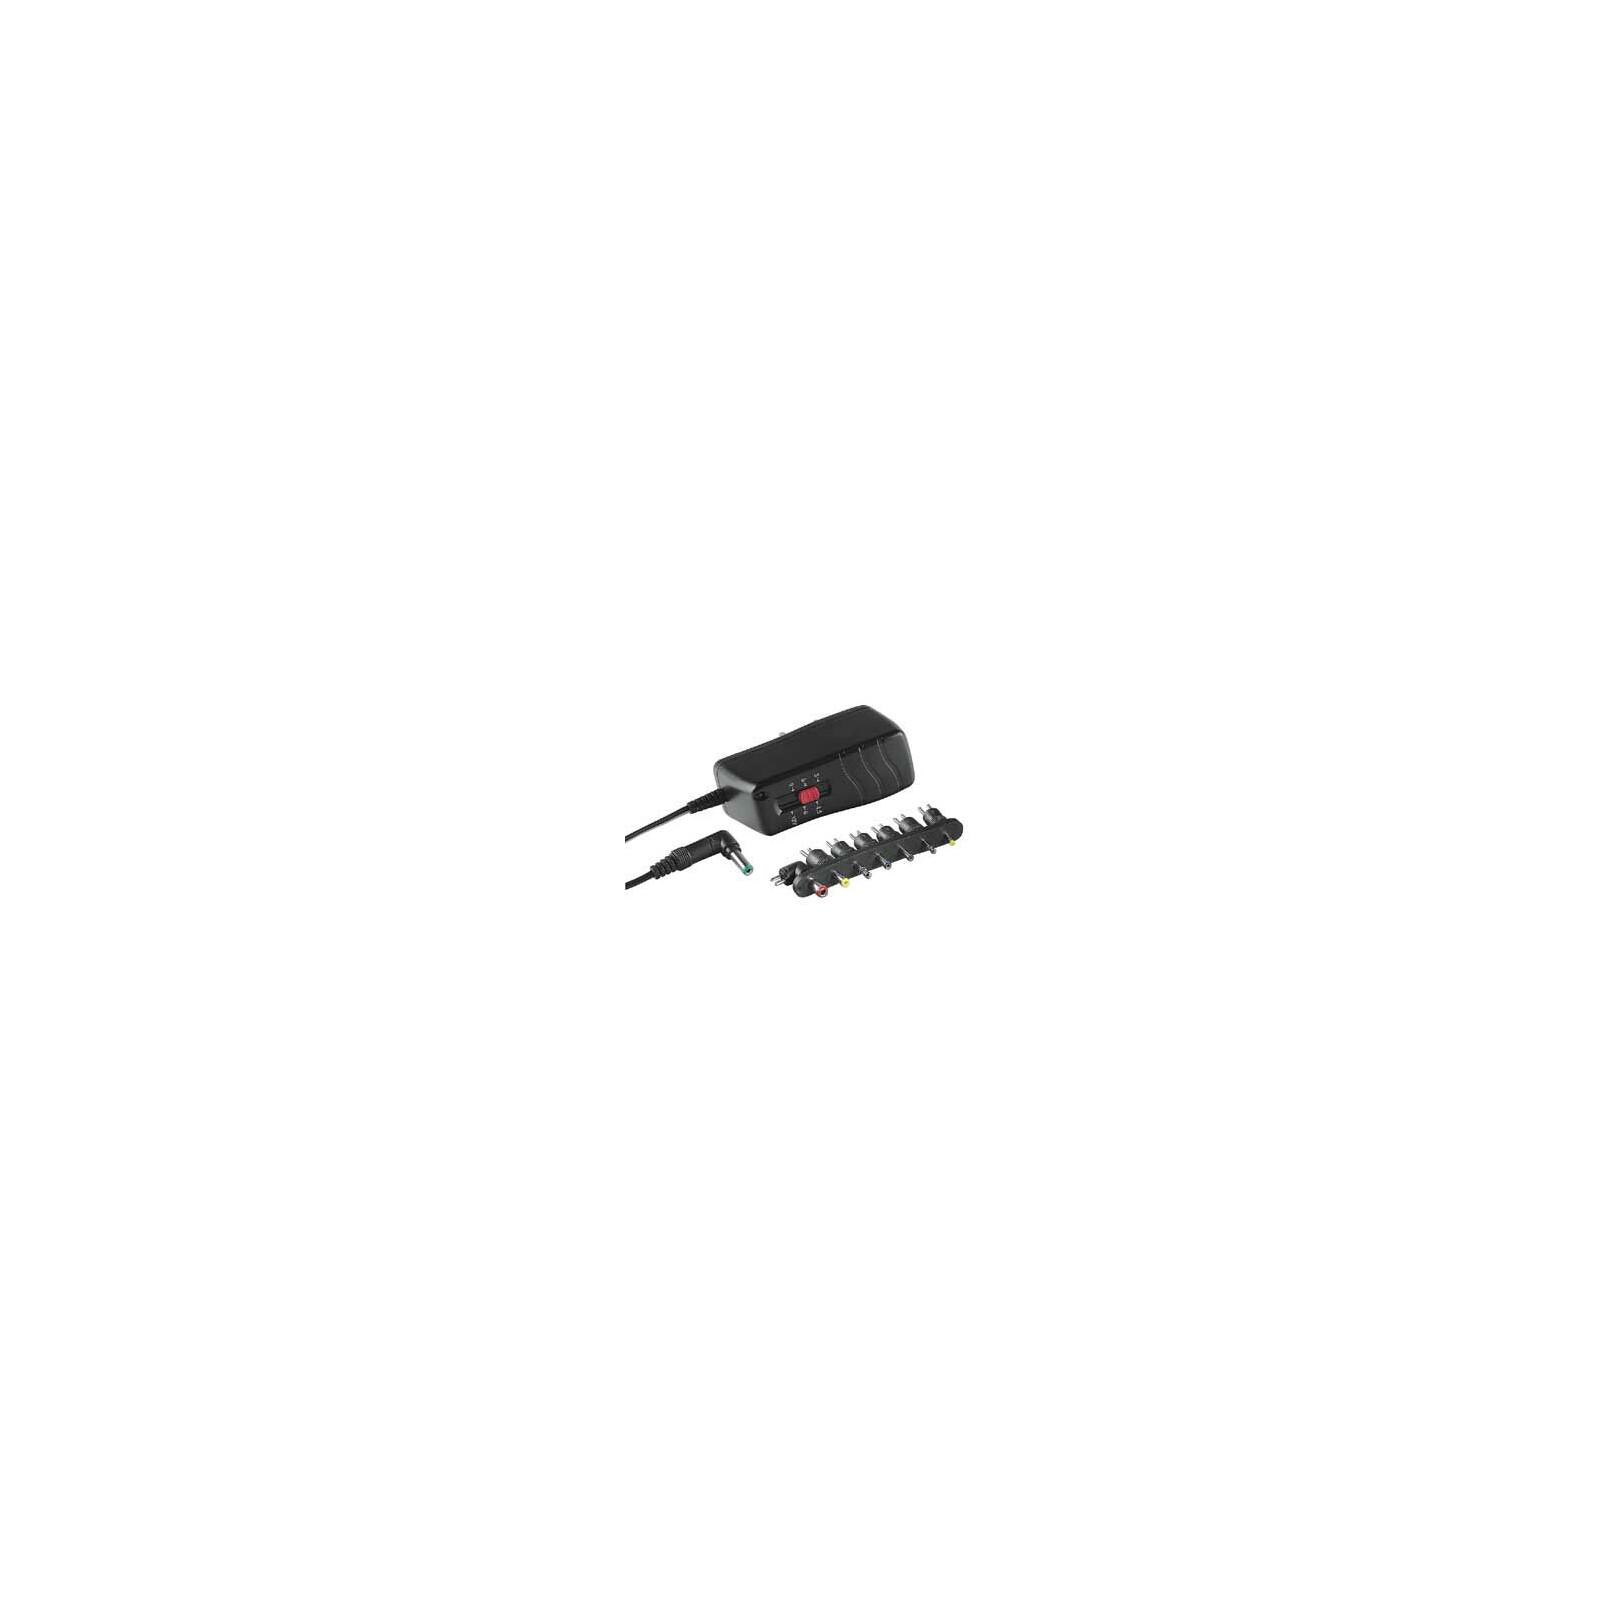 "Hama 46611 UnUniversal-Schaltnetzteil ""Electronic 1.0"", 1000"